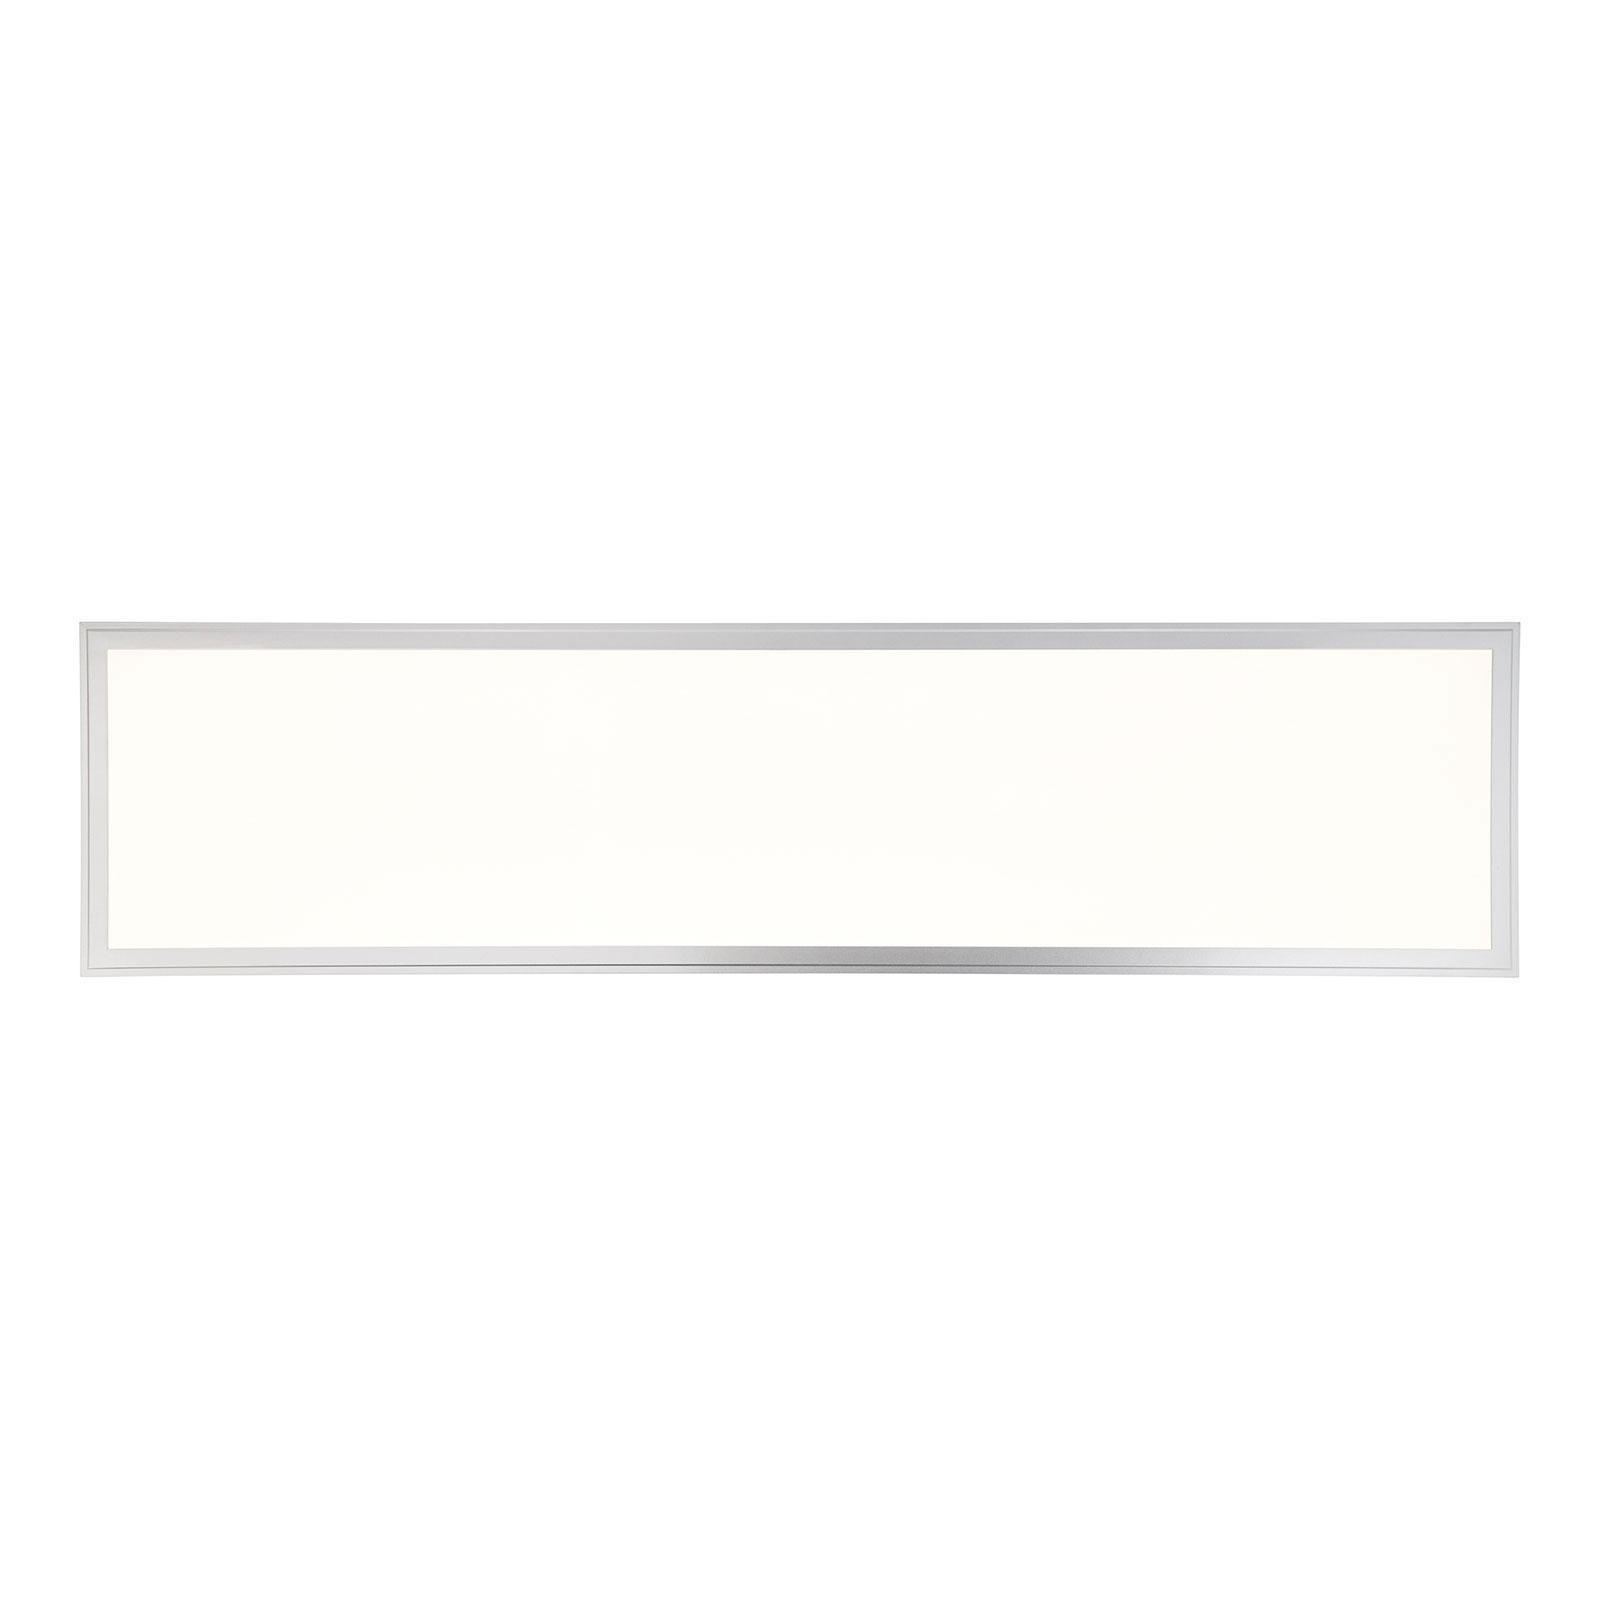 LED plafondlamp Alissa, 119,5x29,5 cm